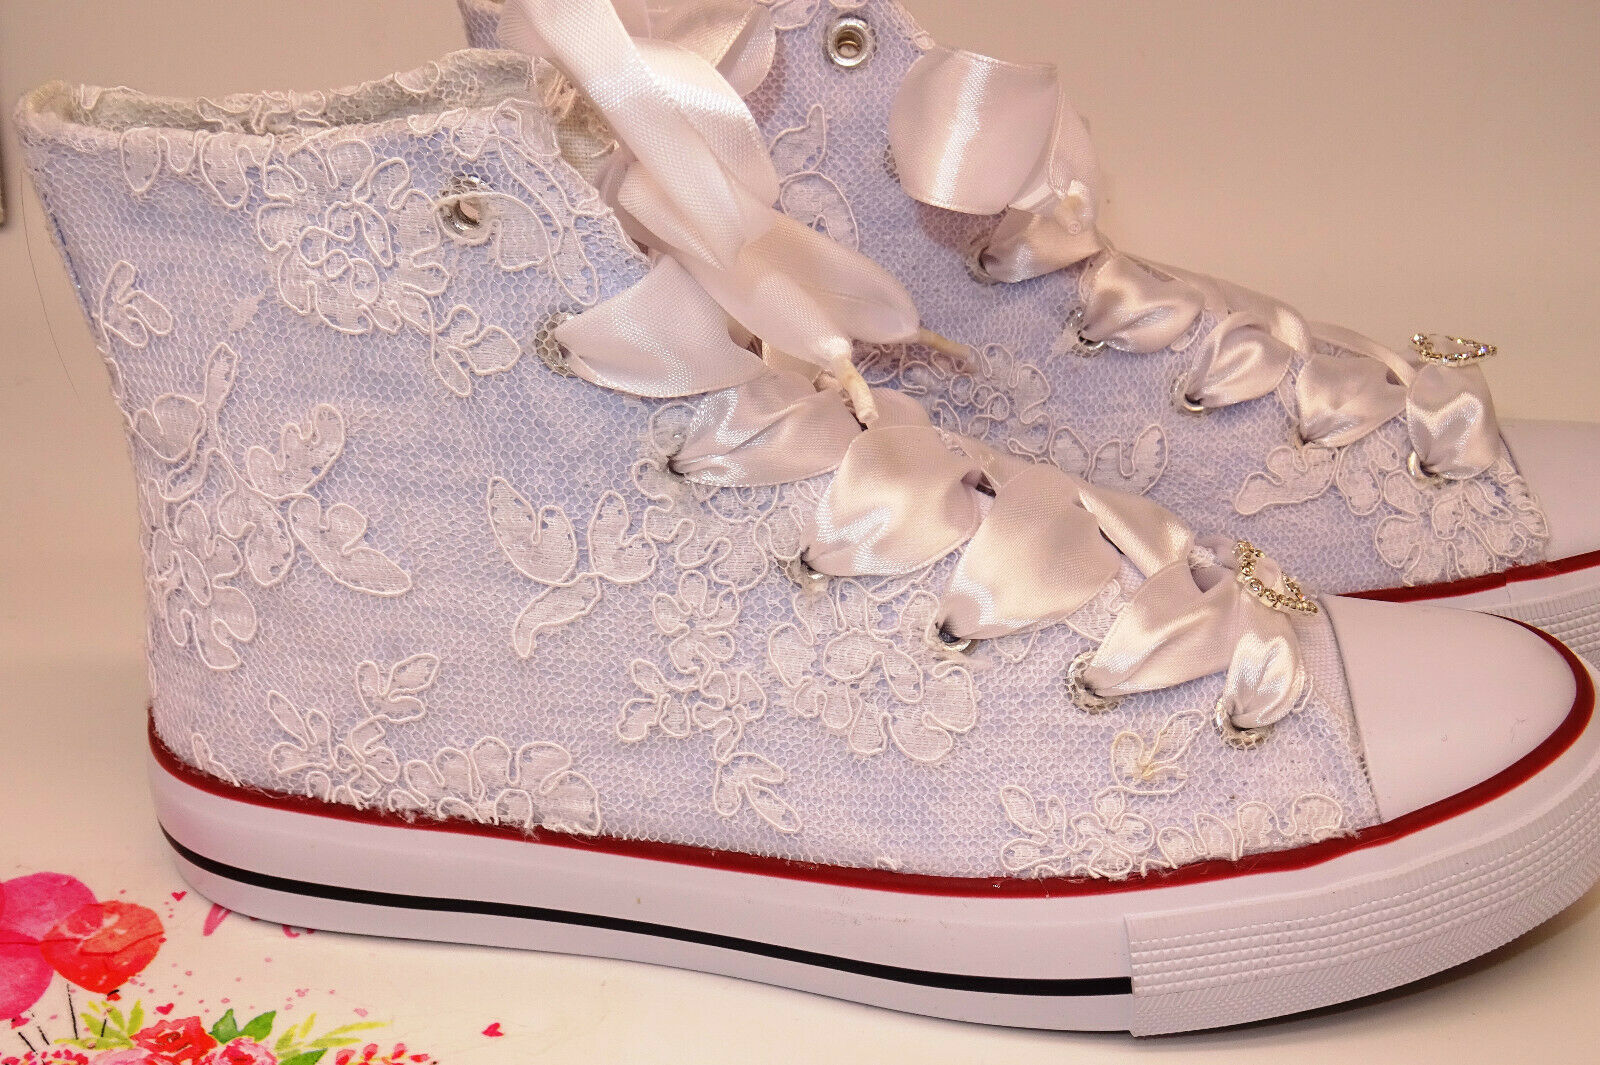 Bridal Shoes Wedding Shoes Sneaker Size 36